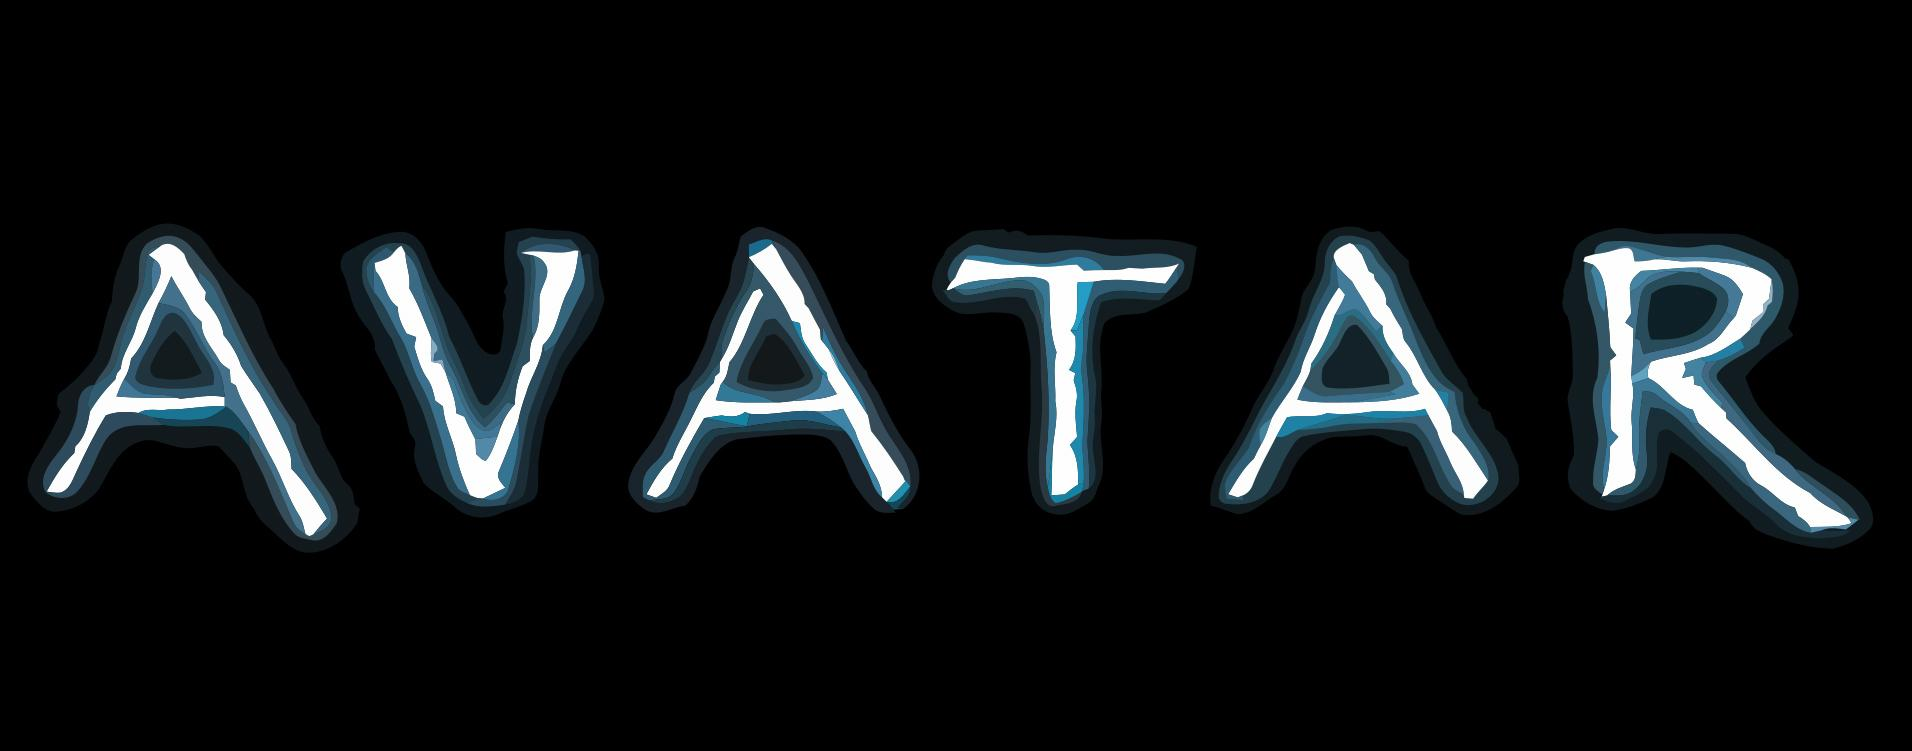 Avatar logo in Papyrus